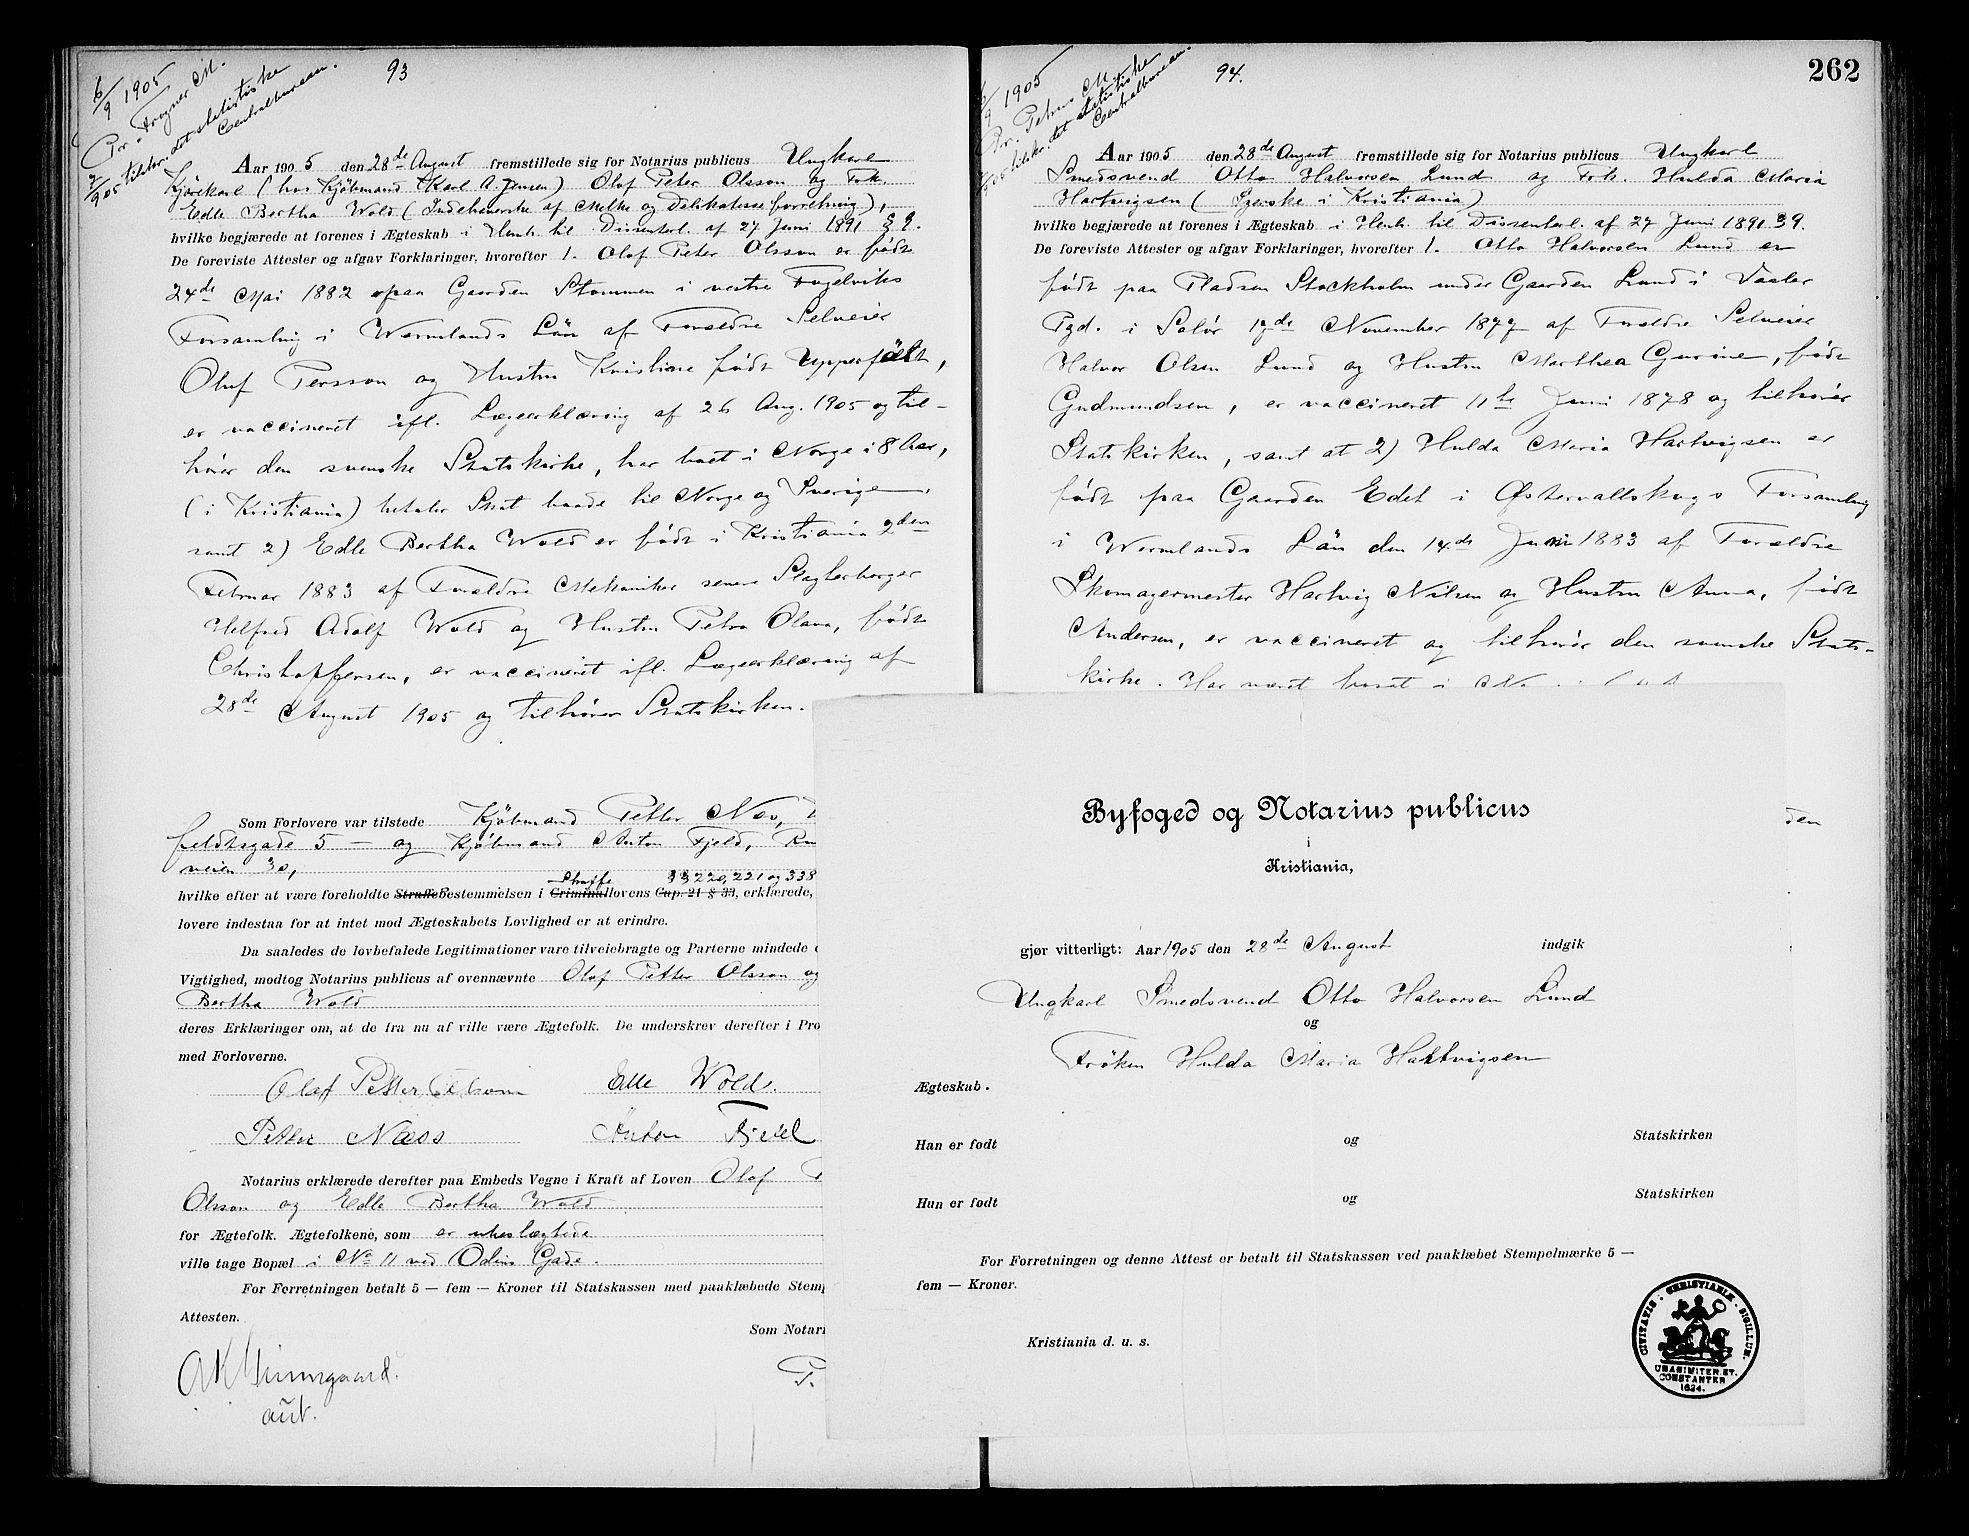 SAO, Oslo byfogd avd. I, L/Lb/Lbb/L0006: Notarialprotokoll, rekke II: Vigsler, 1902-1907, s. 261b-262a